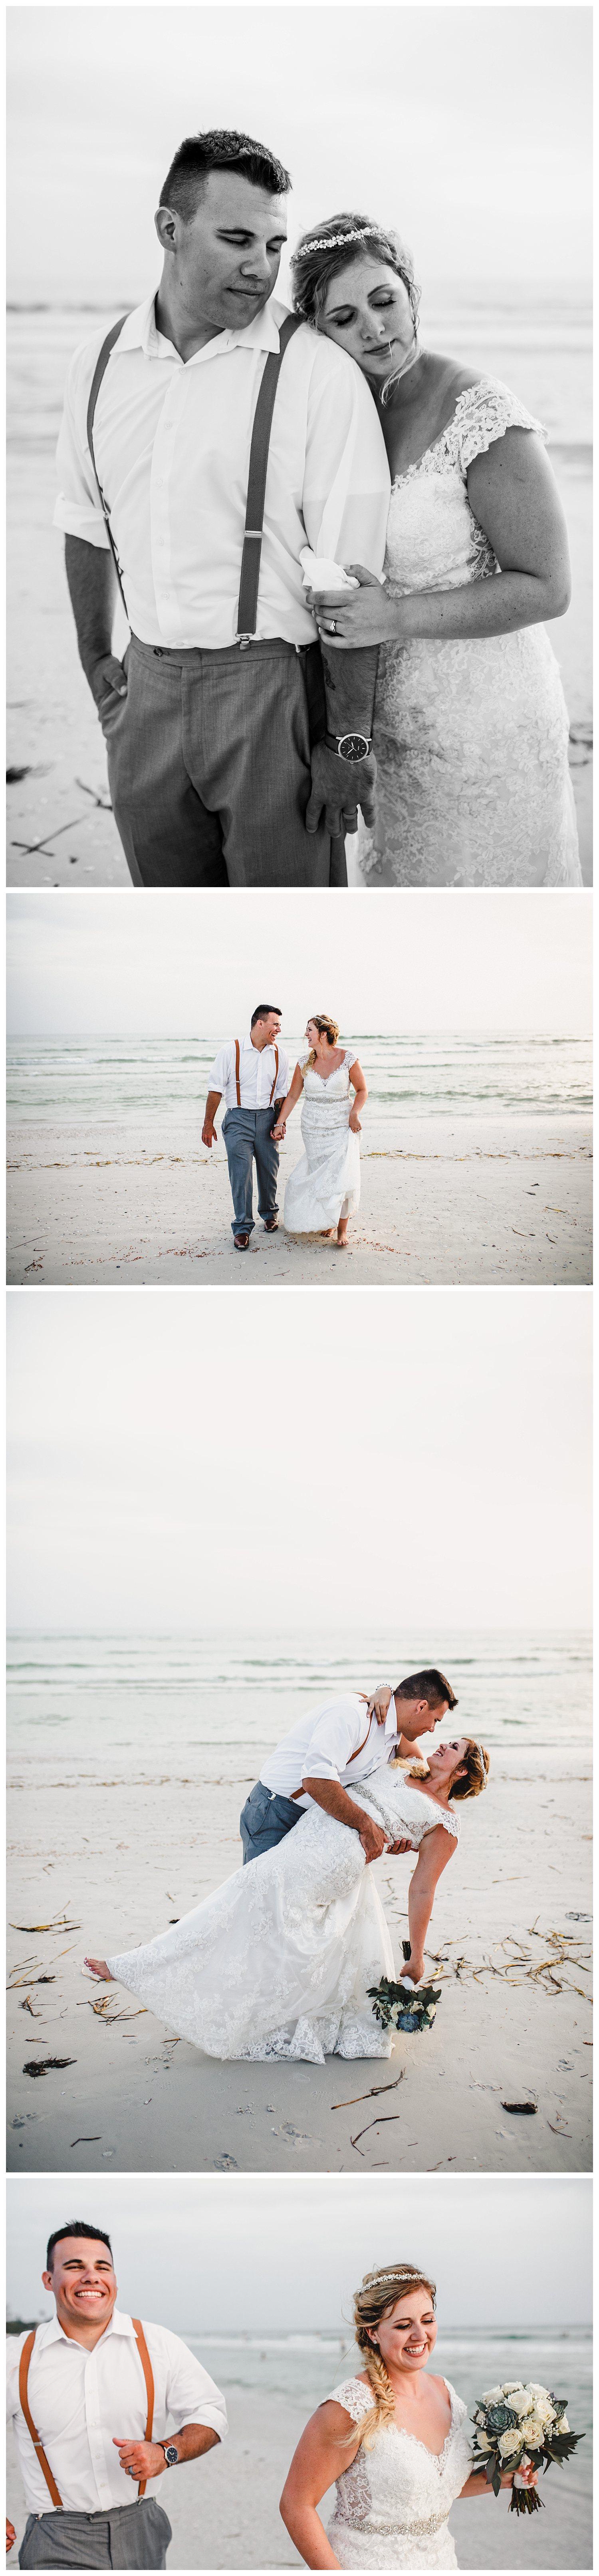 Kelsey_Diane_Photography_Destination_Wedding_Sarasota_Florida_Beach_Wedding_Alex_Austin_0682.jpg